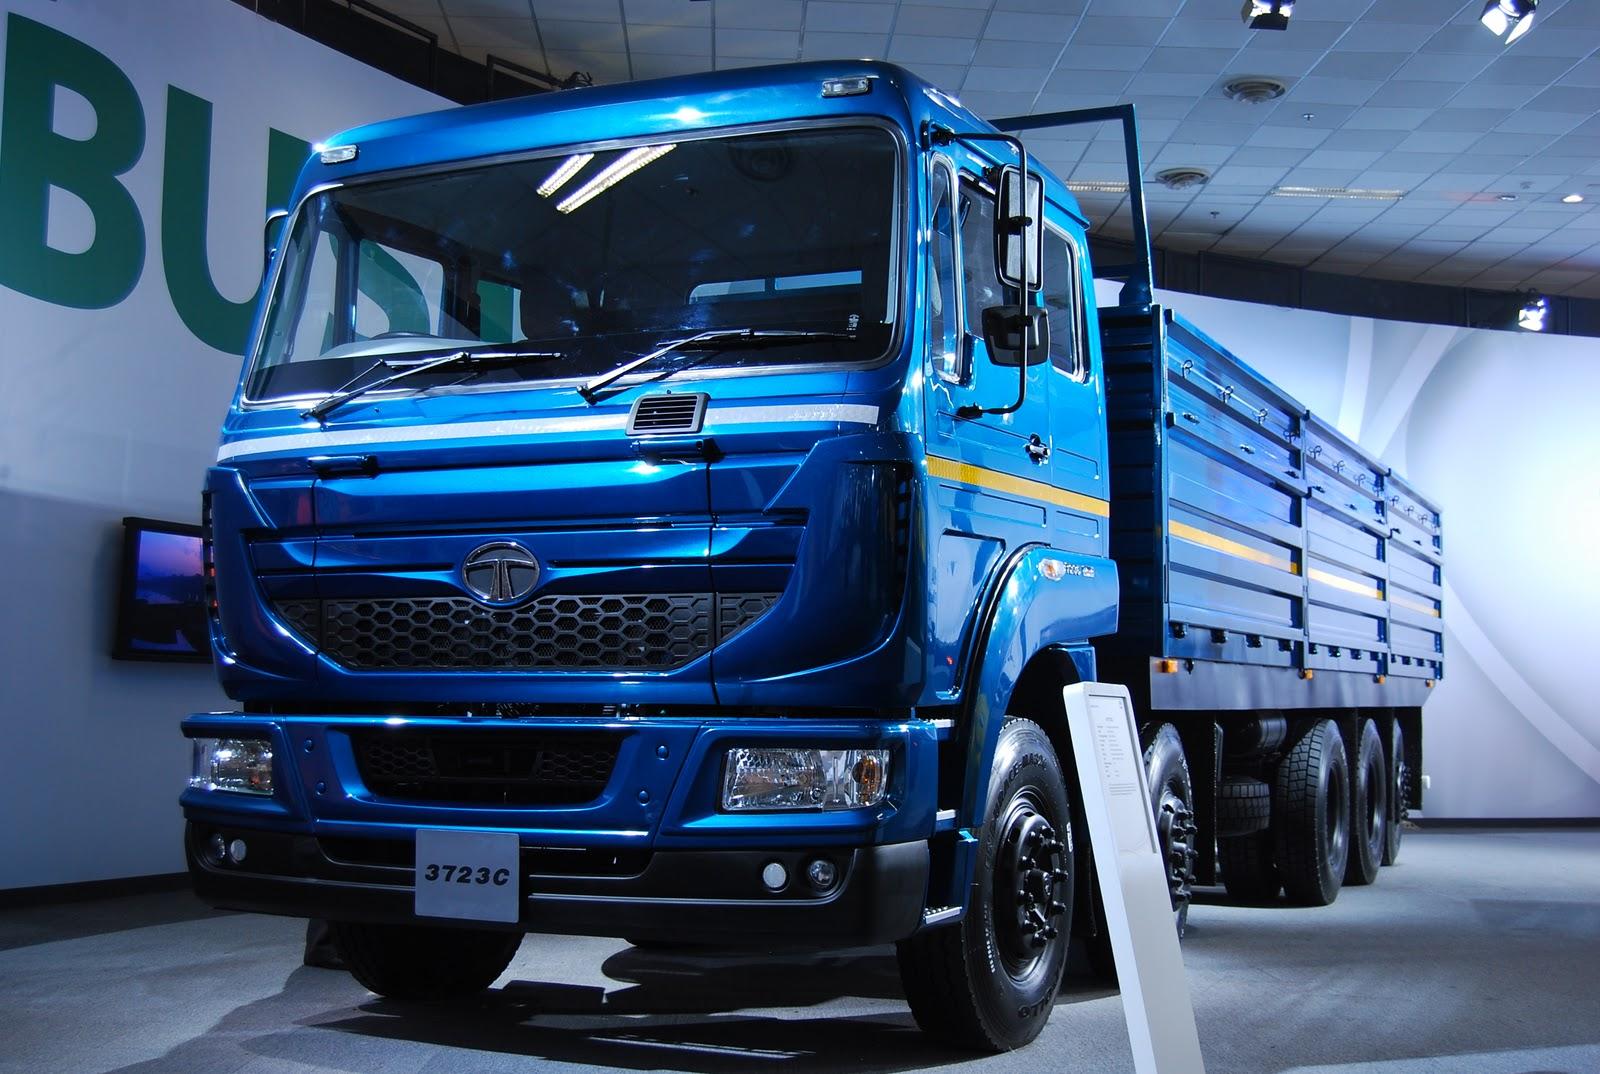 SPAROOW DESIGNS: Auto Expo 2012 Delhi Launch of TATA LPT ...